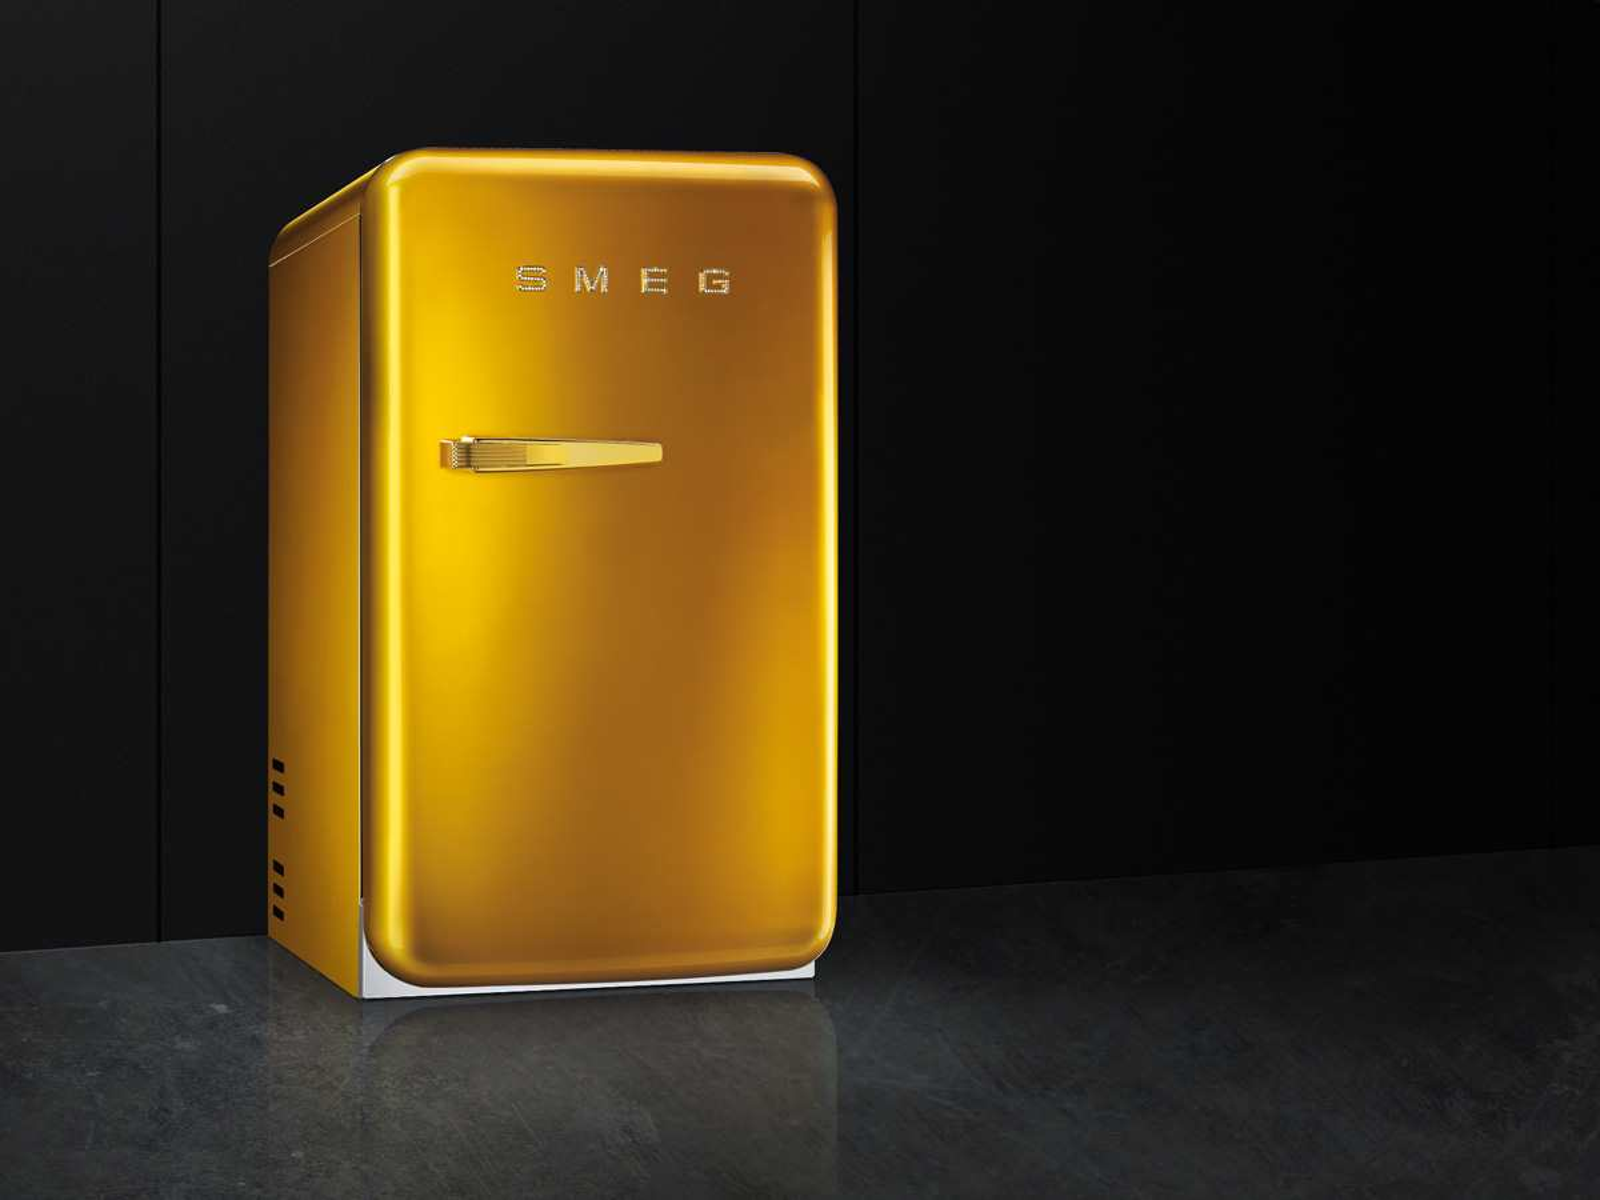 Smeg Kühlschrank Orange : Goldene zeiten bei smeg smeg de